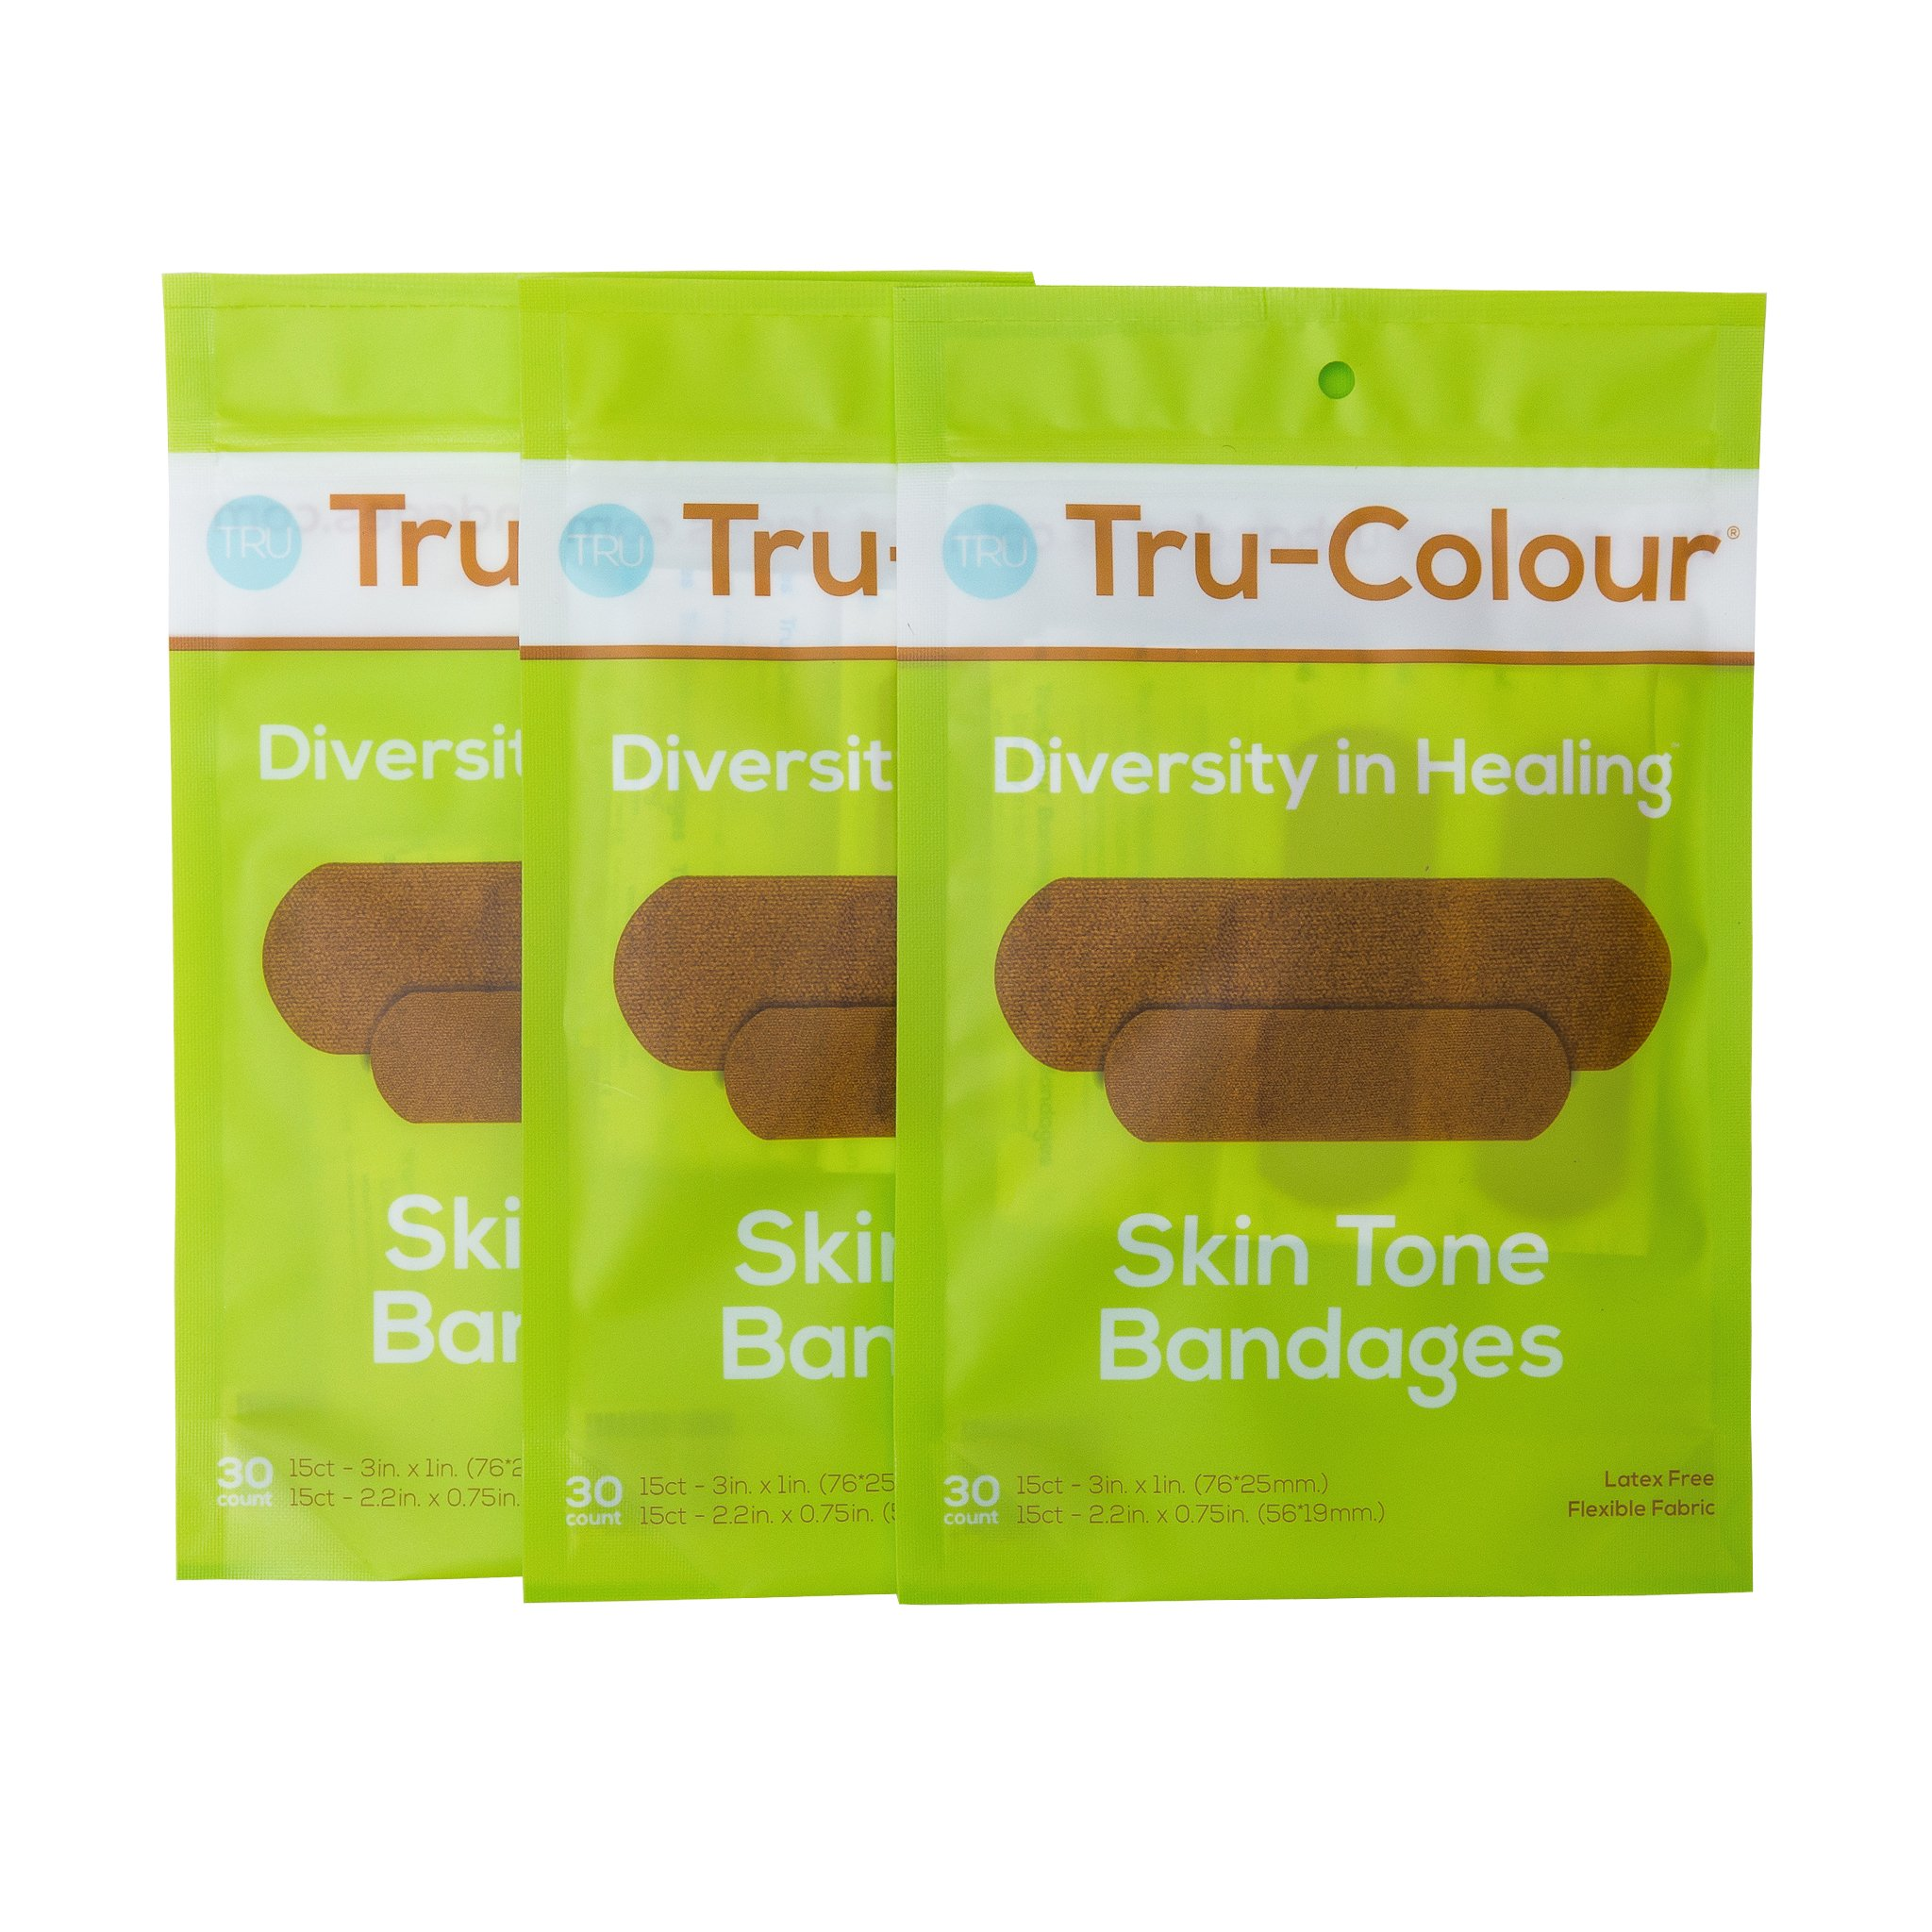 Tru-Colour Bandages Skin Tone Flexible Fabric Bandages (Green Bag) - 3 Pack (90 Count)